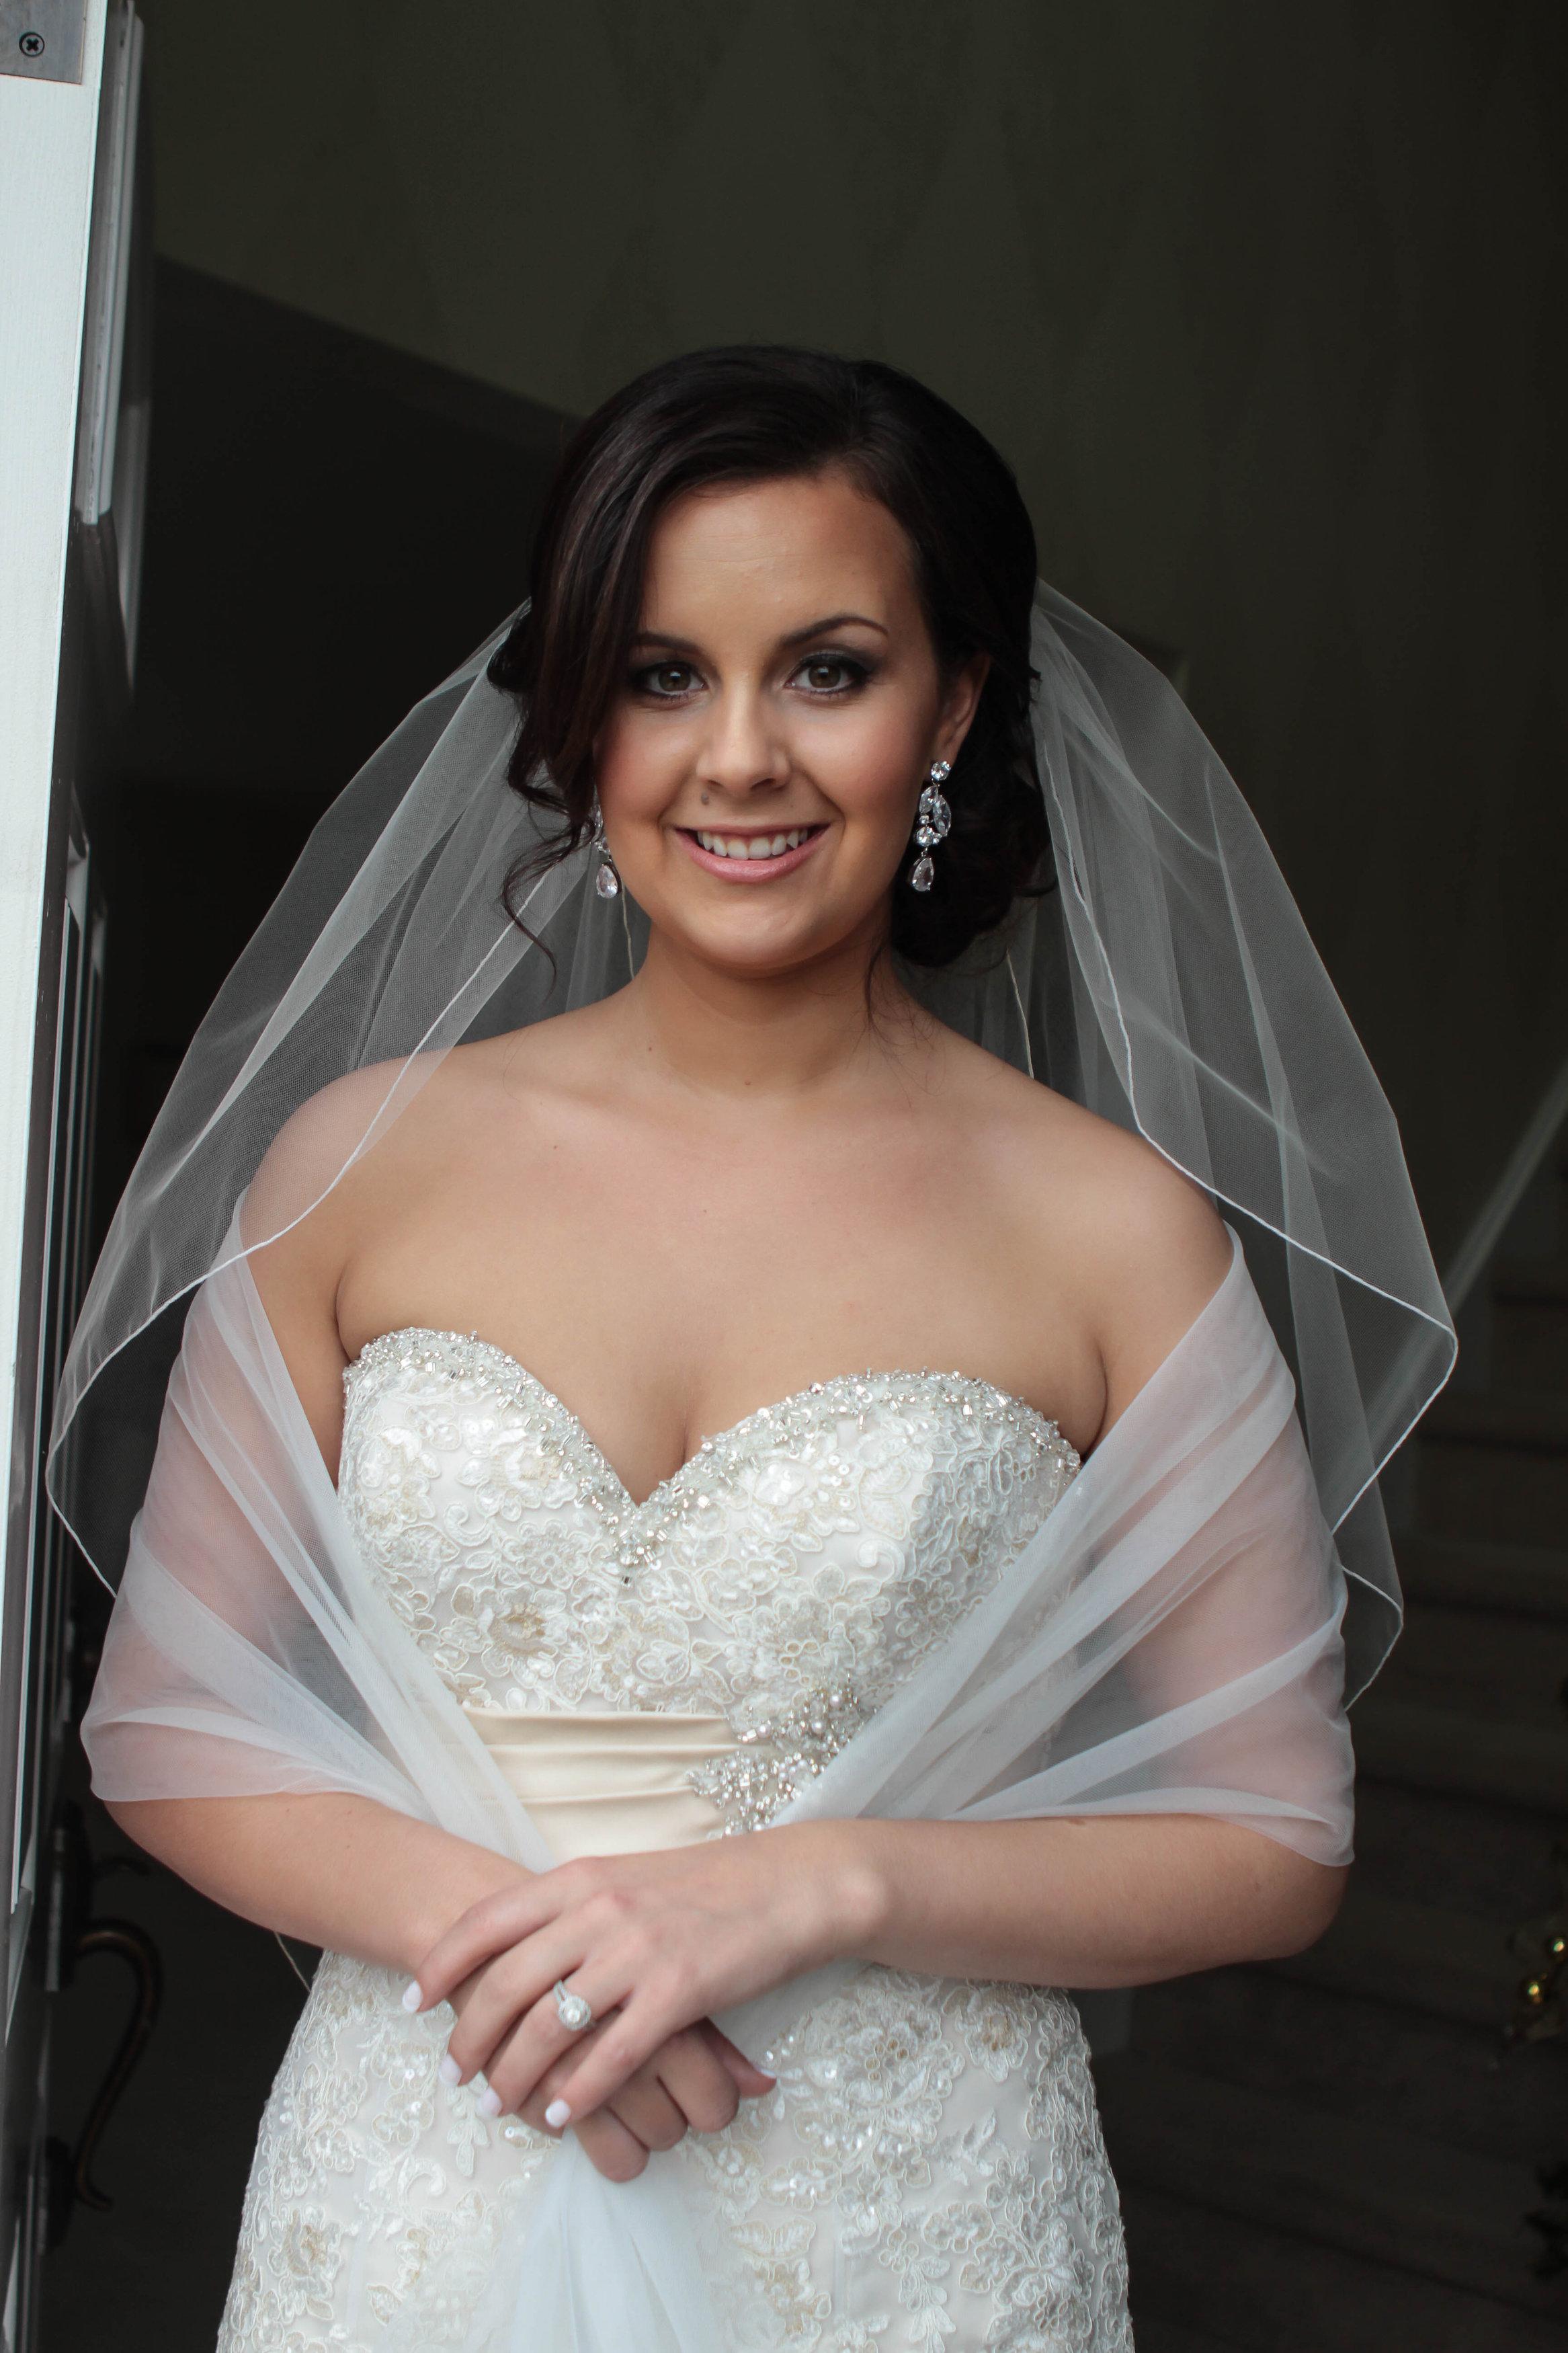 Wedding Wednesday Blog Post on Why We Love Veils. LGBT Friendly Philadelphia Photographer Swiger Photography